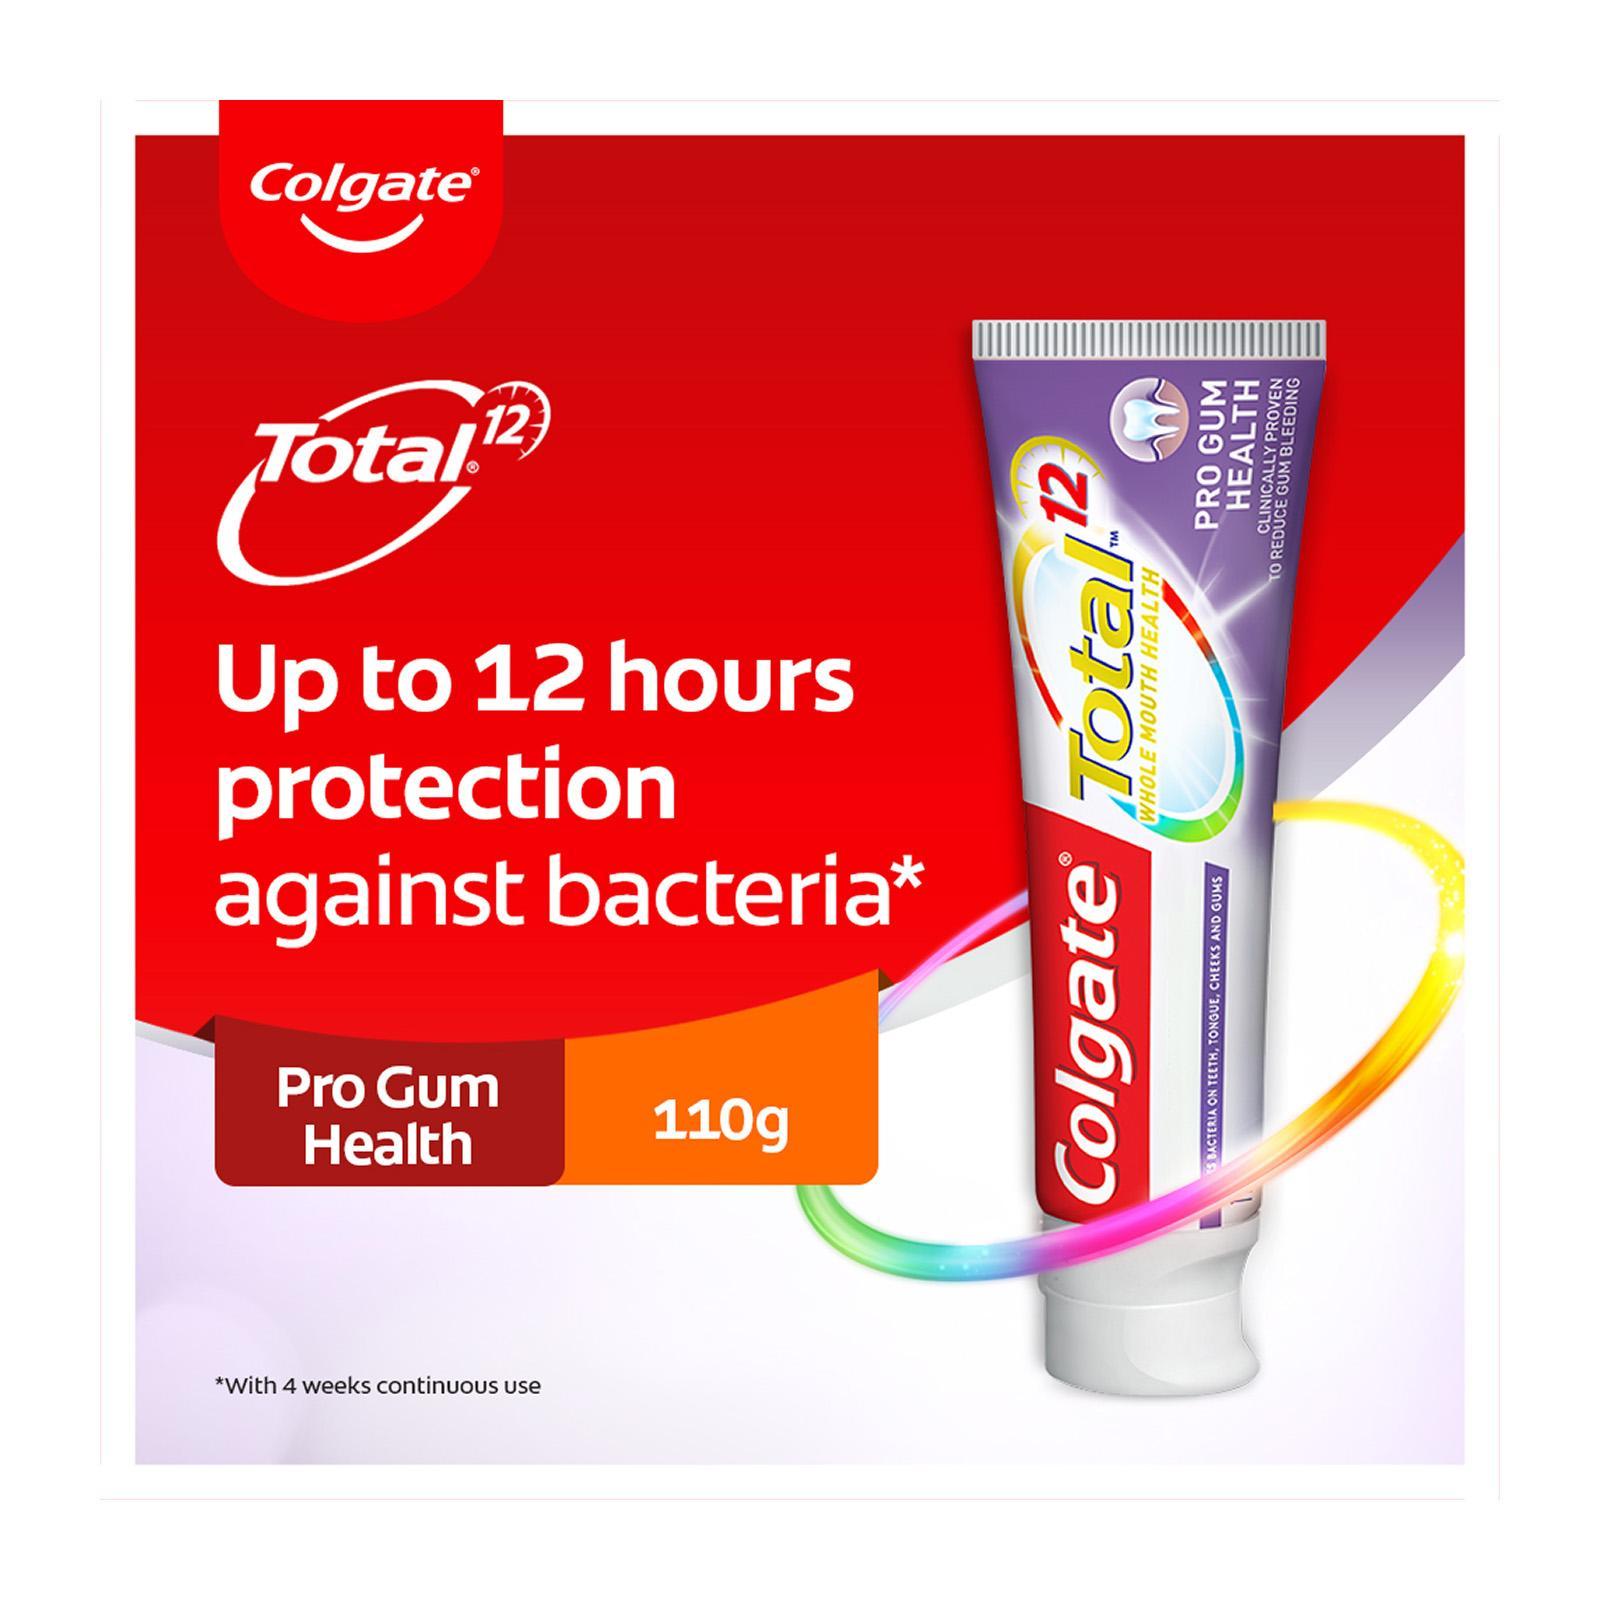 Colgate Total Pro Gum Health Antibacterial Toothpaste 110g